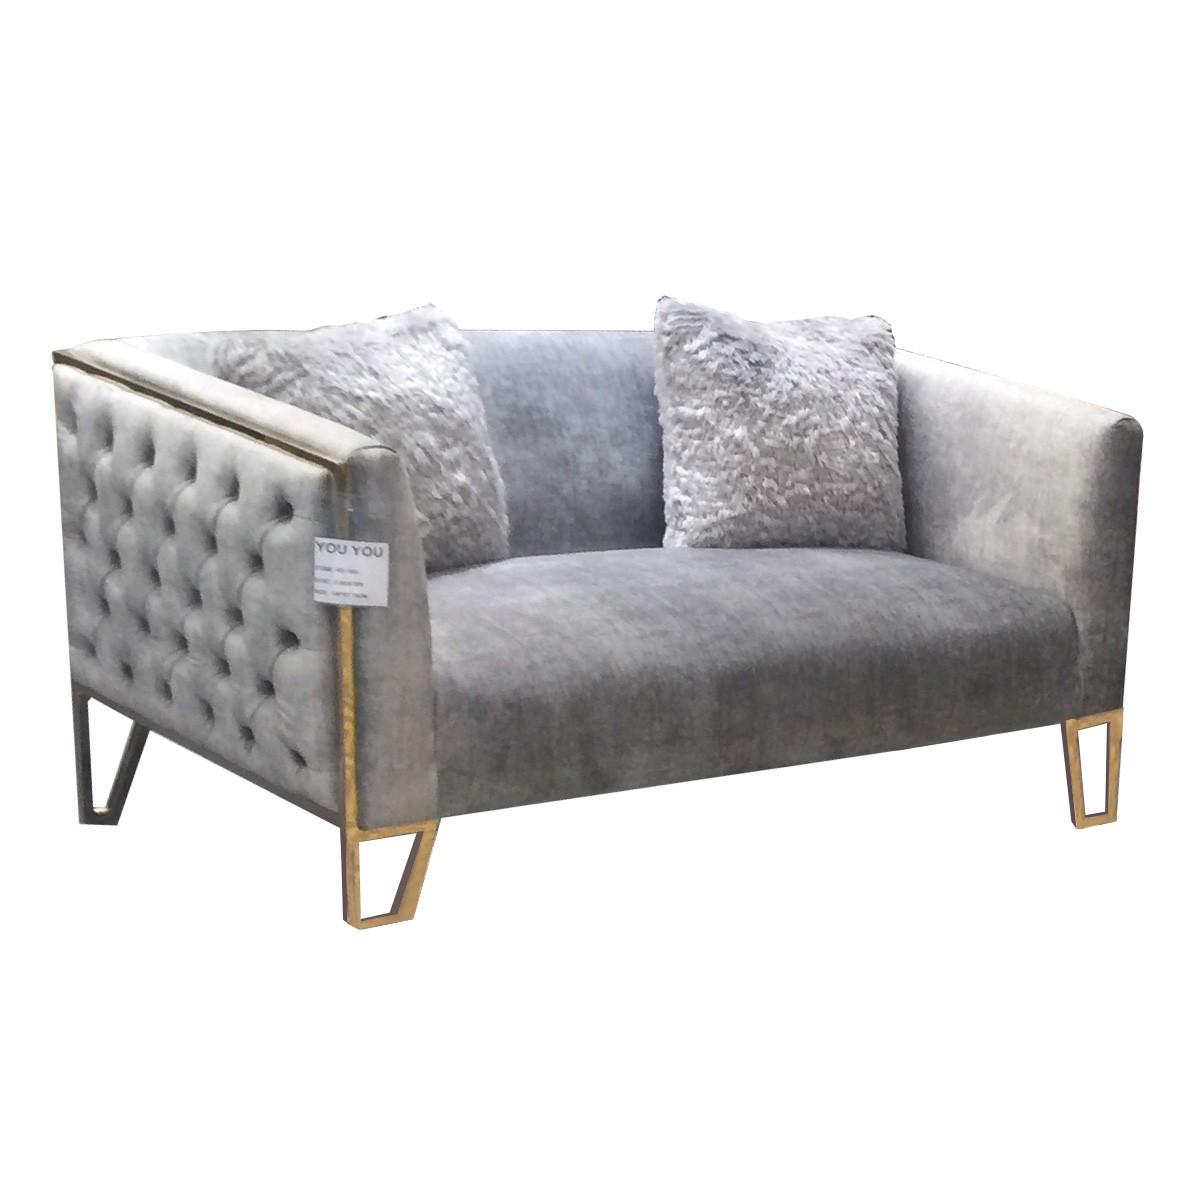 Alice Fabric Sofa, 2 Seater, Grey / Gold